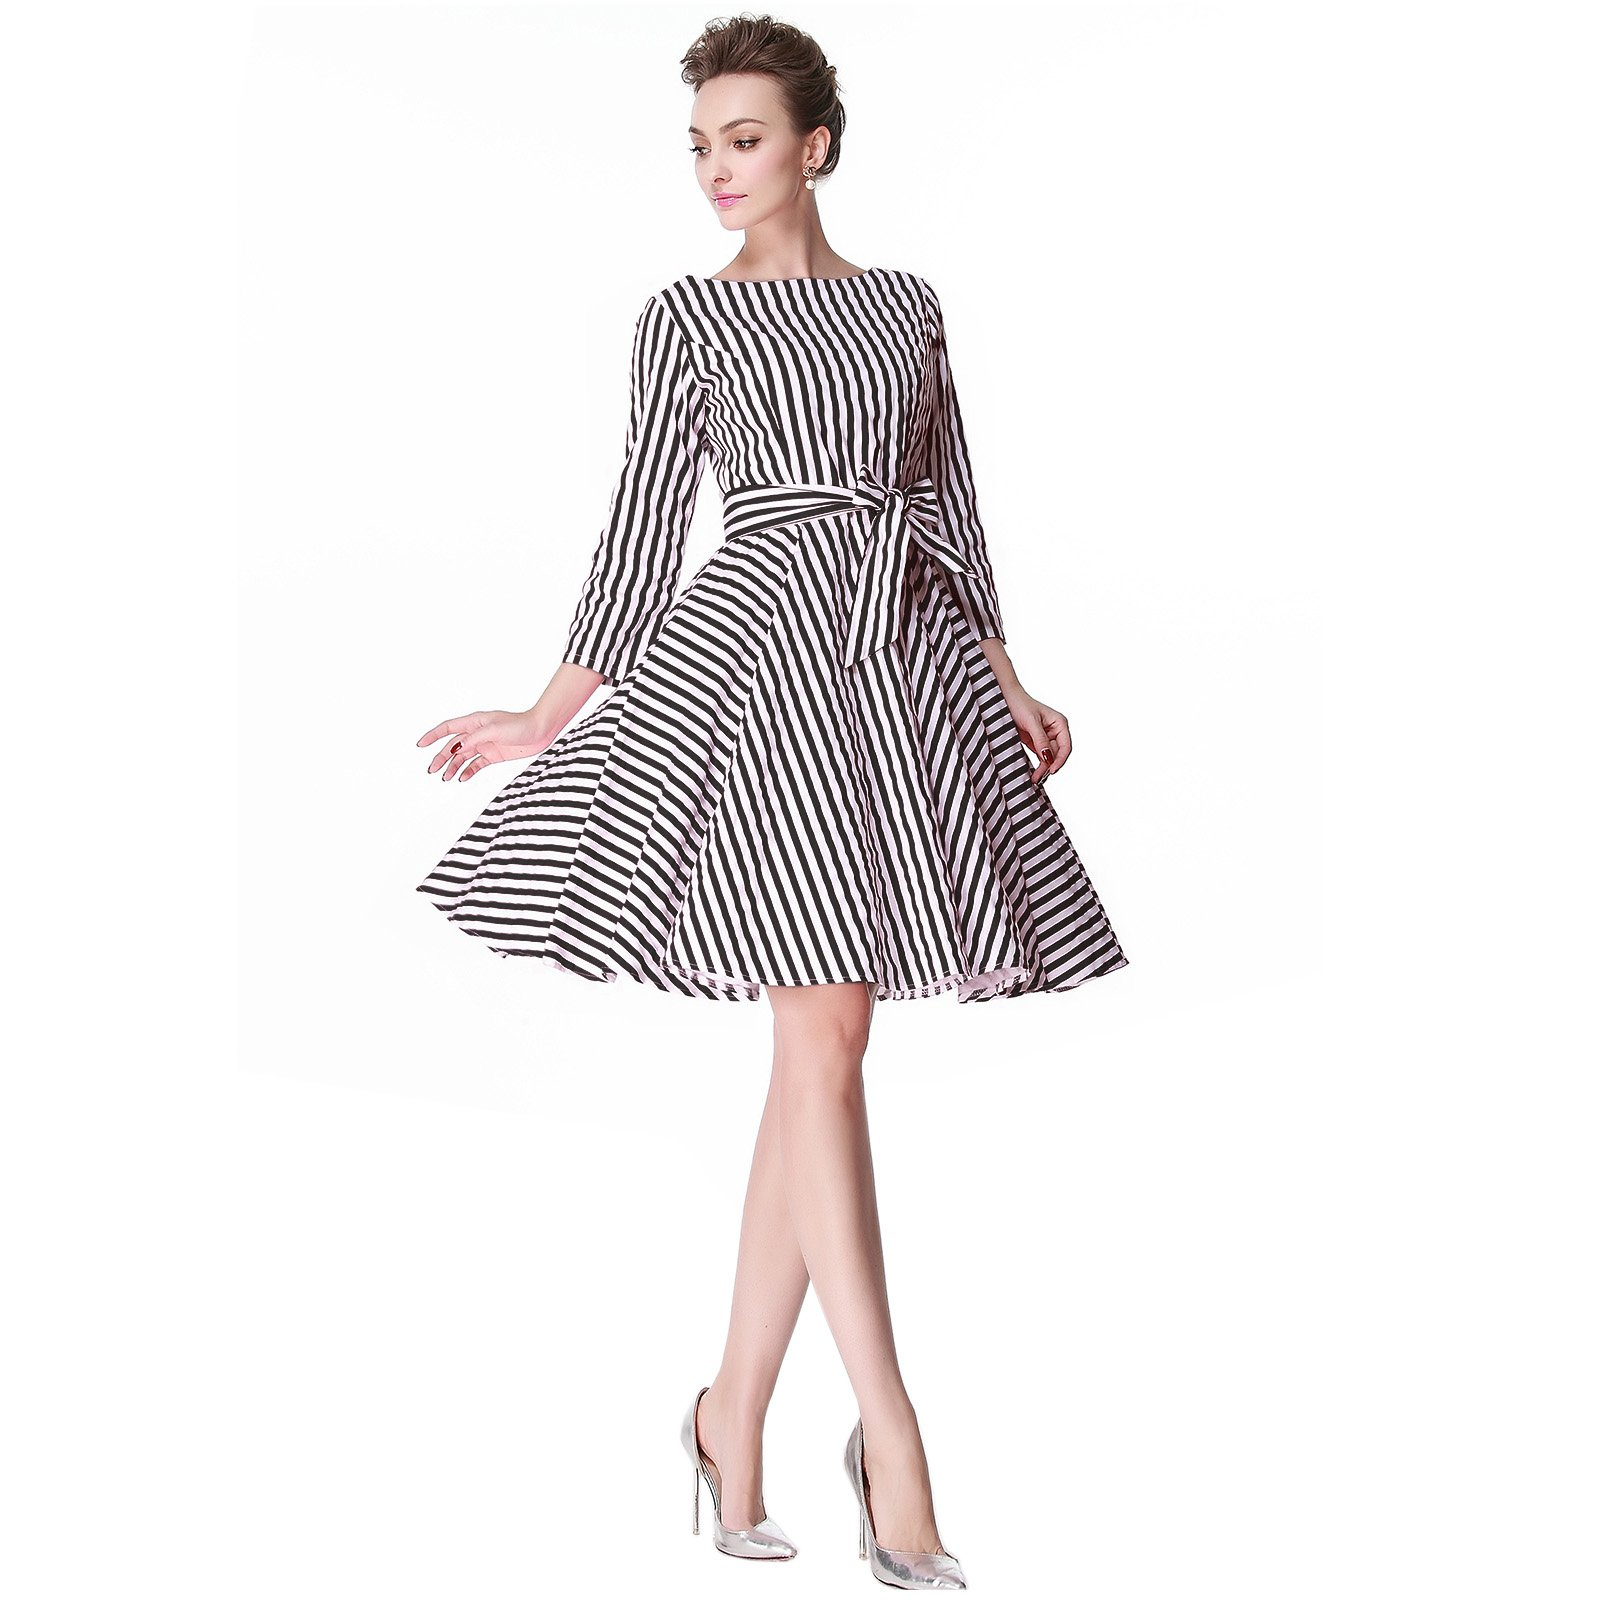 Heroecol 50s 60s Hepburn 3/4 Sleeve Style Vintage Retro Swing Rockailly Dresses Size M Color Black Stripe